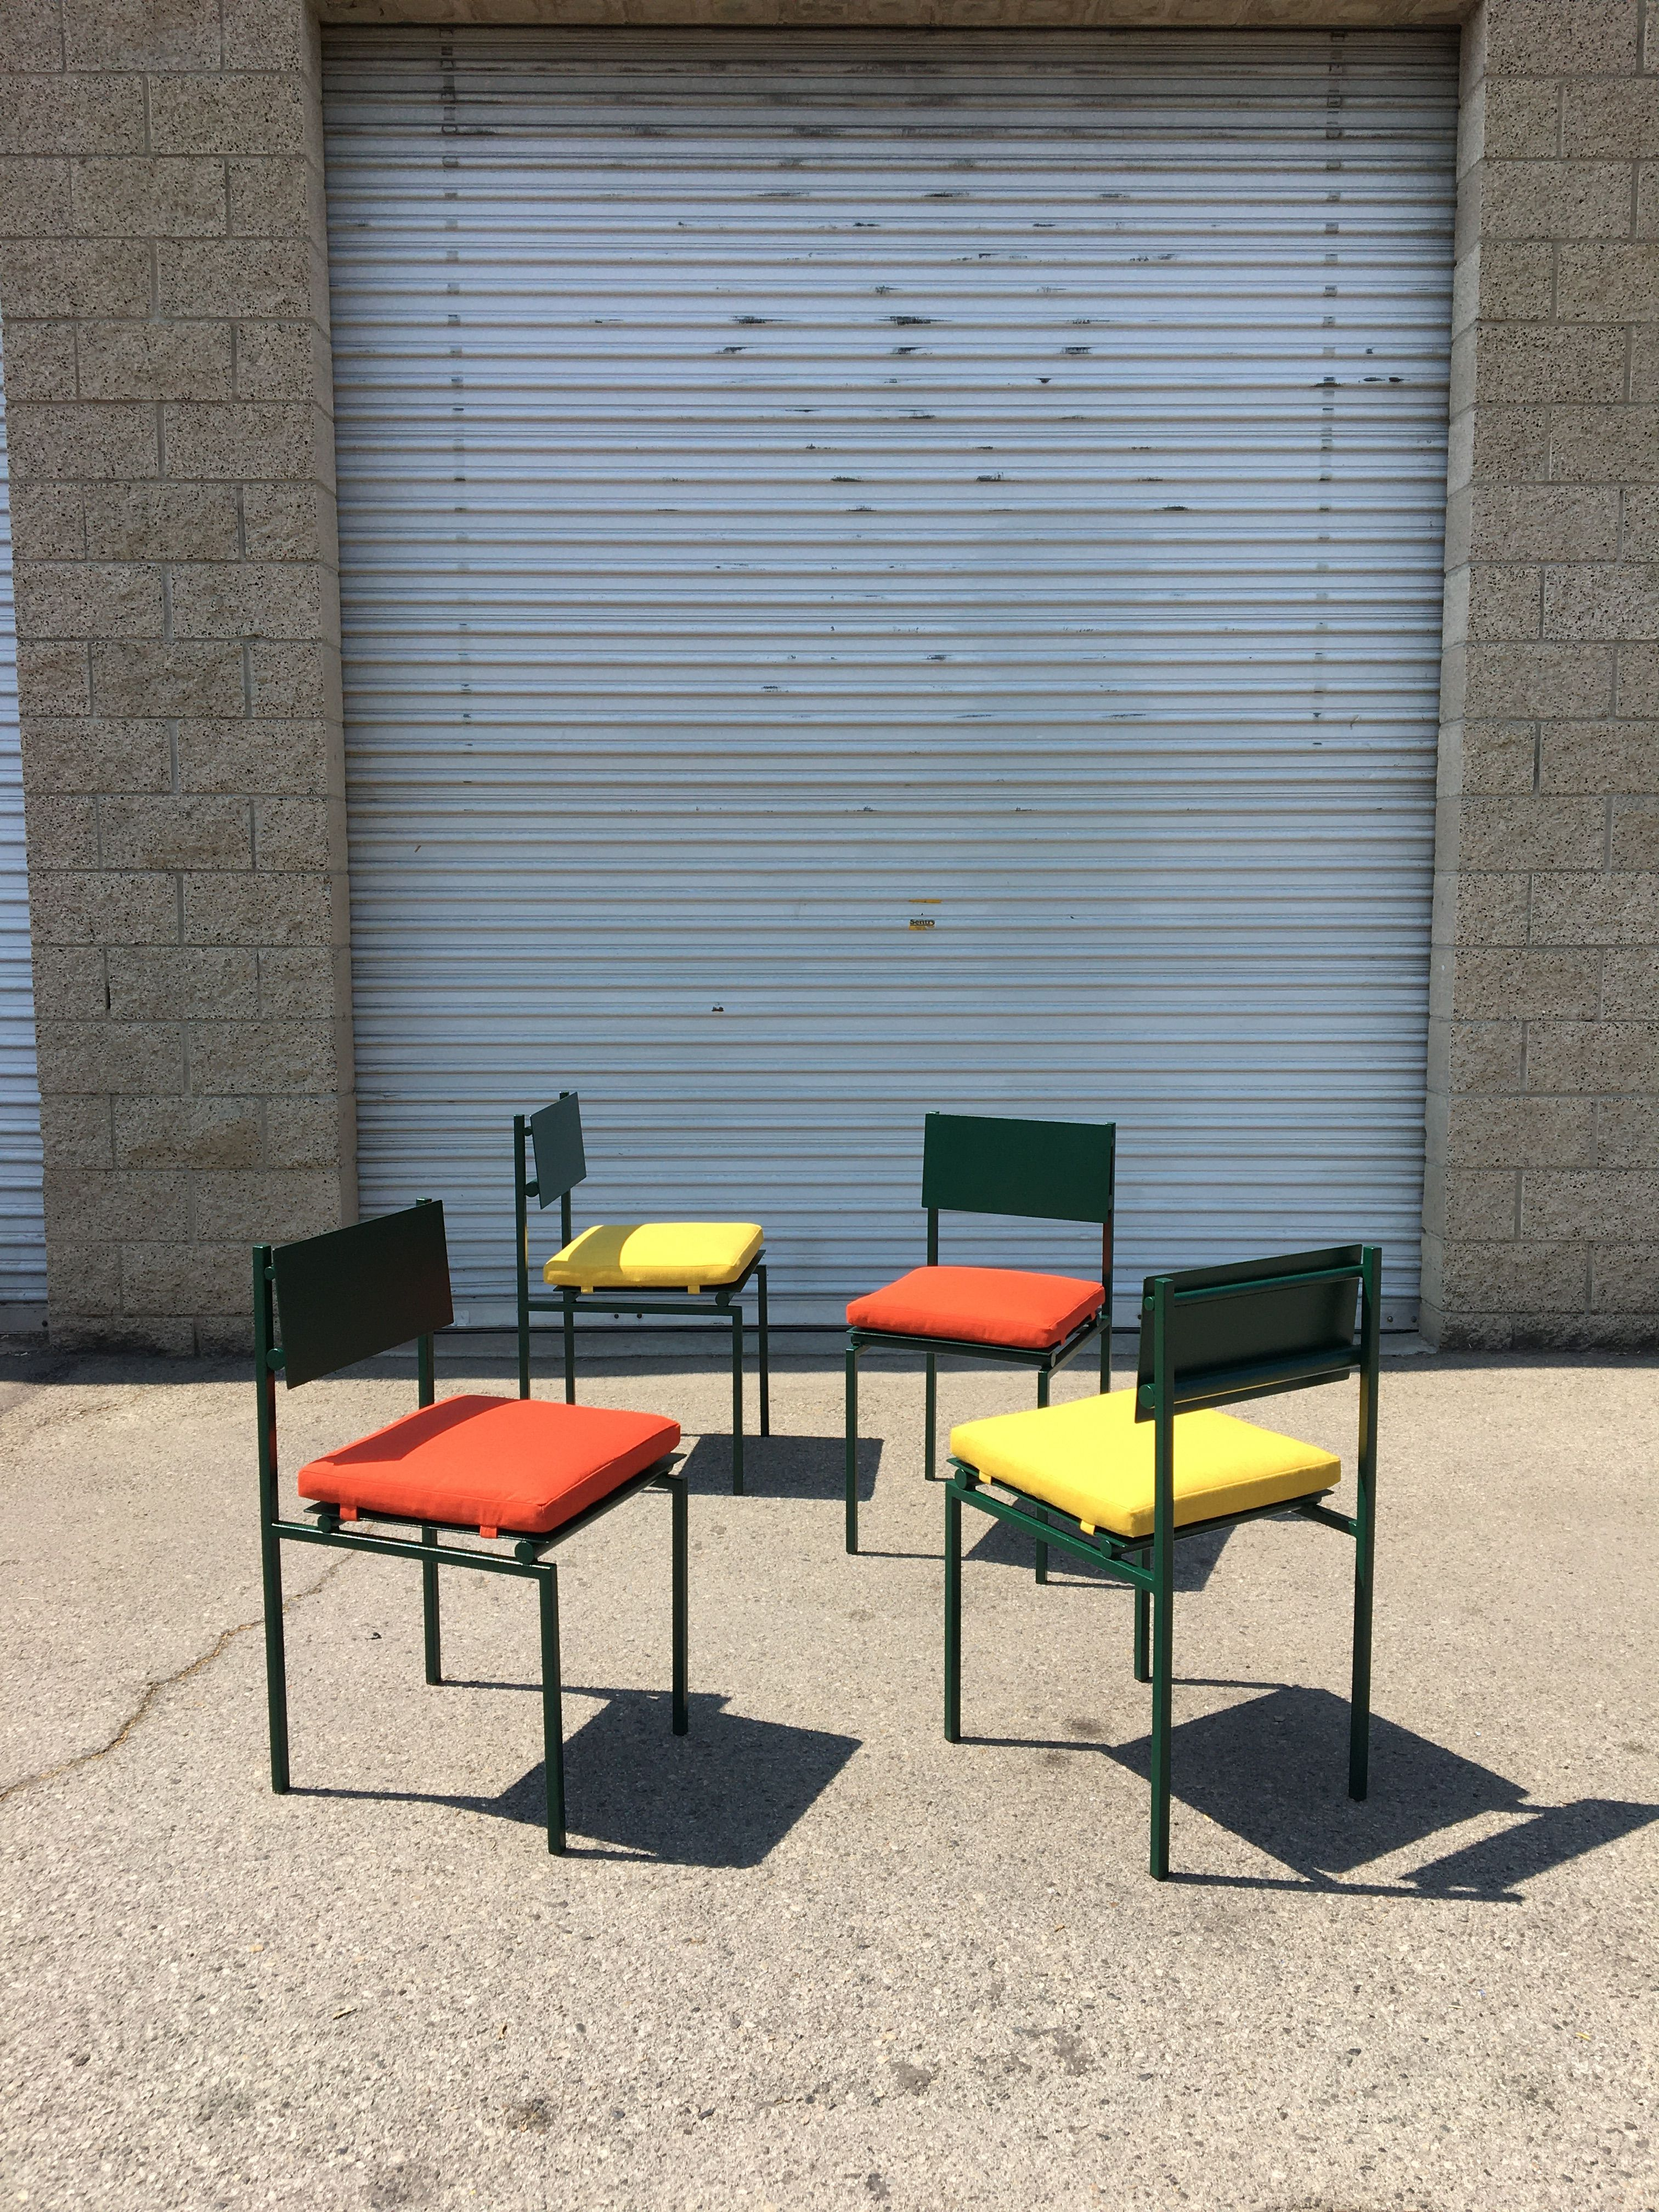 Suspension Metal Set - Breakfast Size product image 24